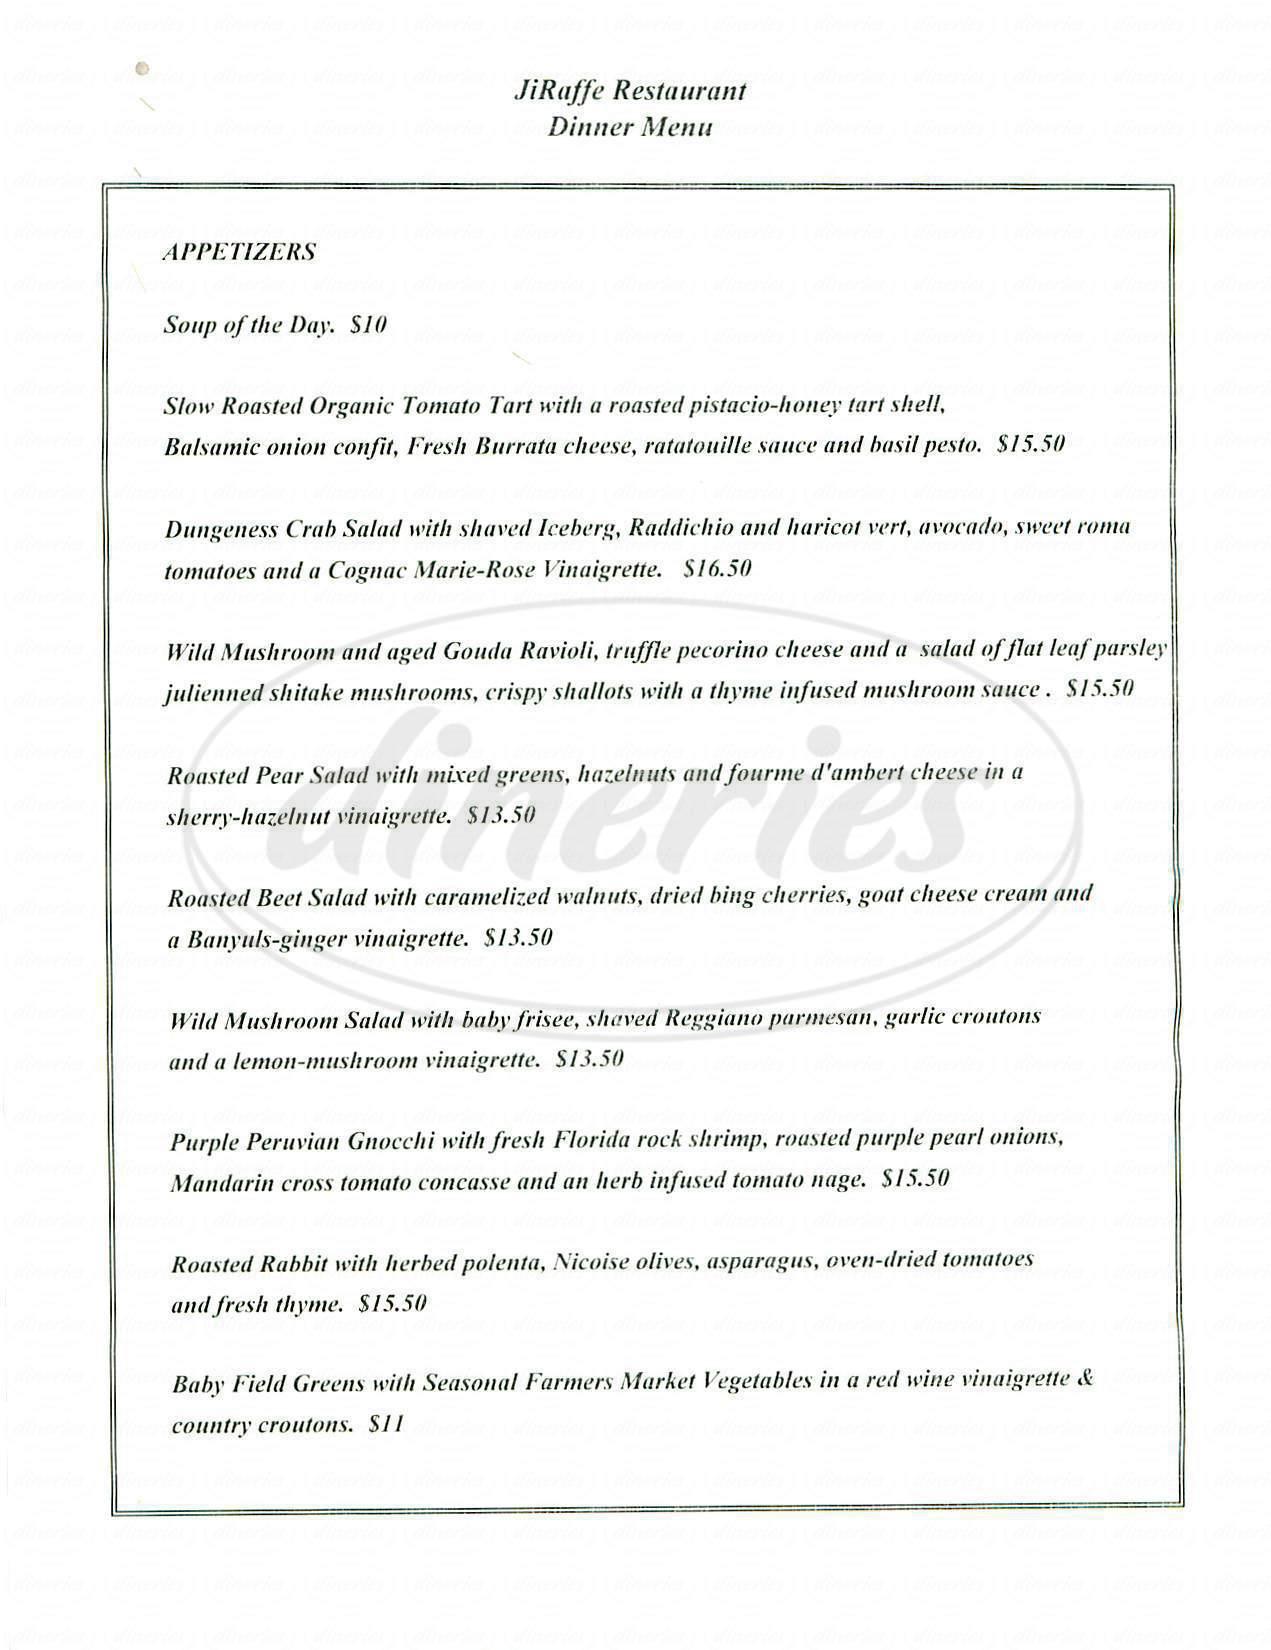 menu for JiRaffe Restaurant